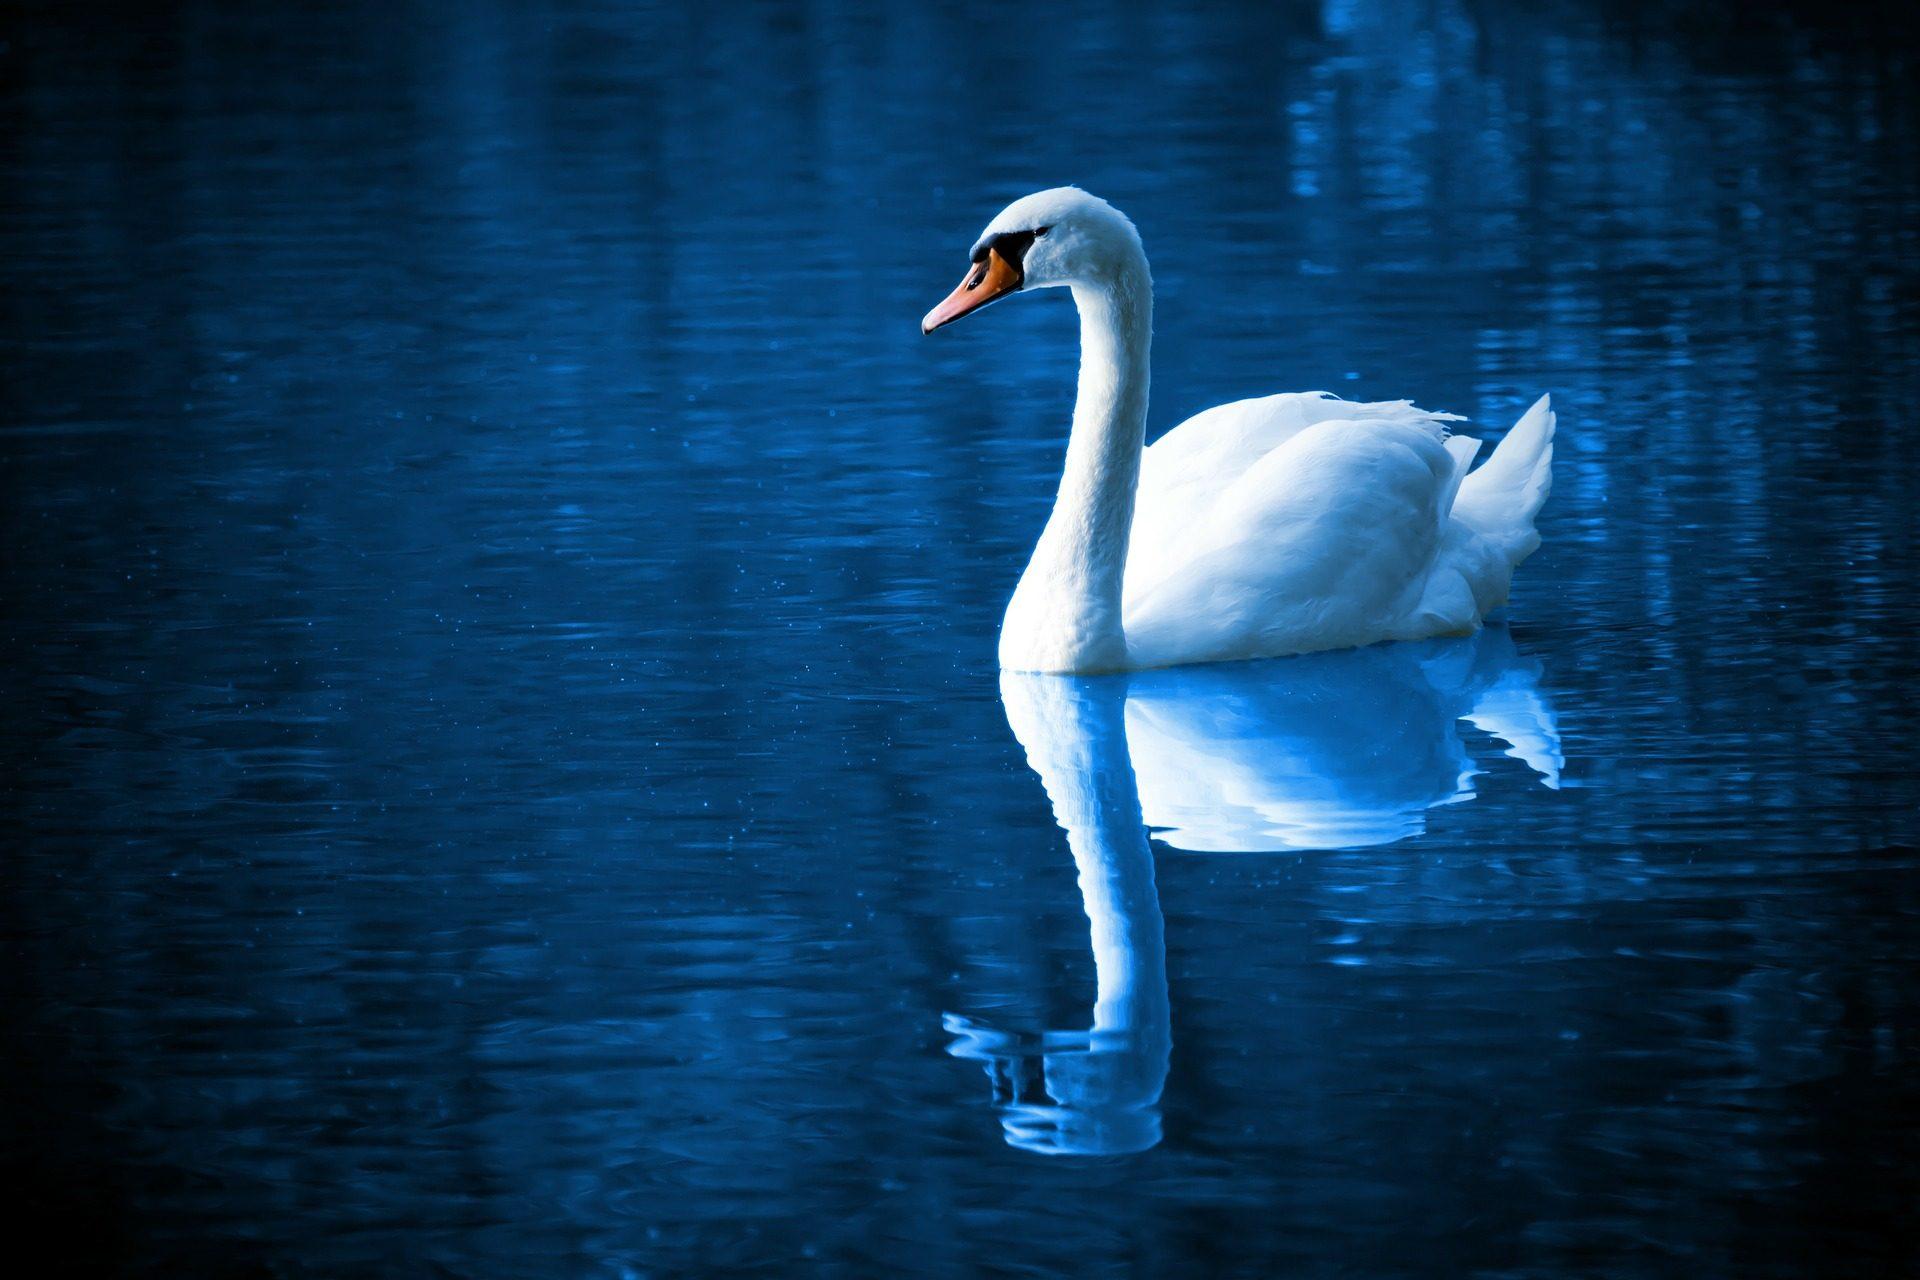 Swan, Lago, Ave, reflexão, Majestic - Papéis de parede HD - Professor-falken.com